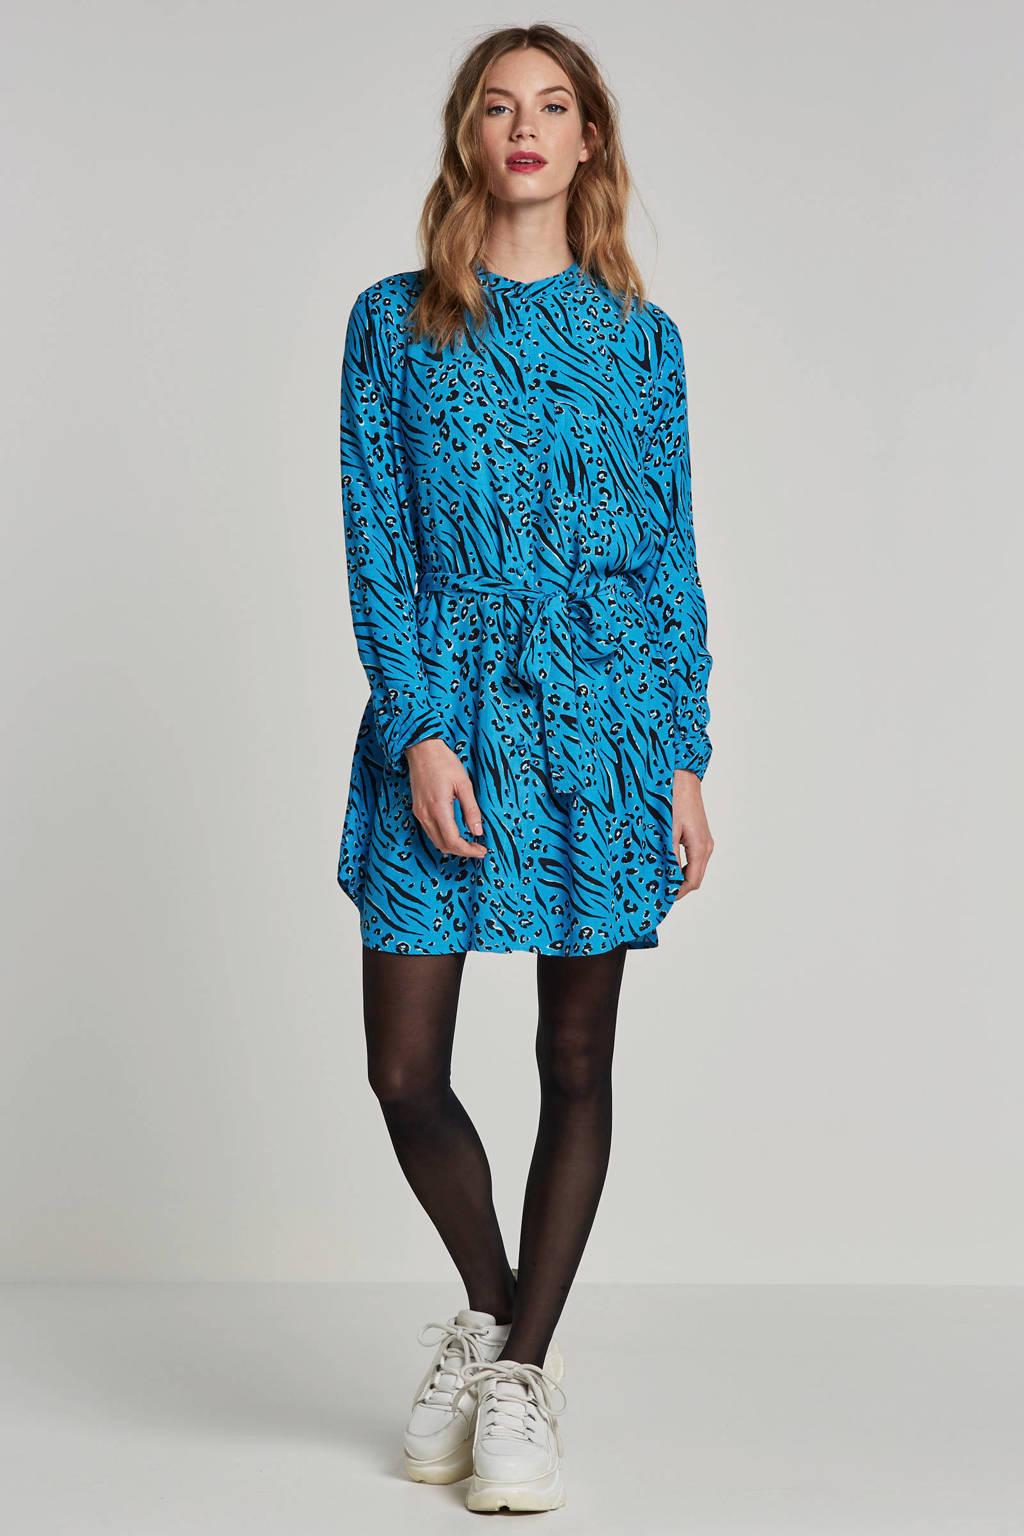 ONLY blouse jurk met all over print, Blauw/zwart